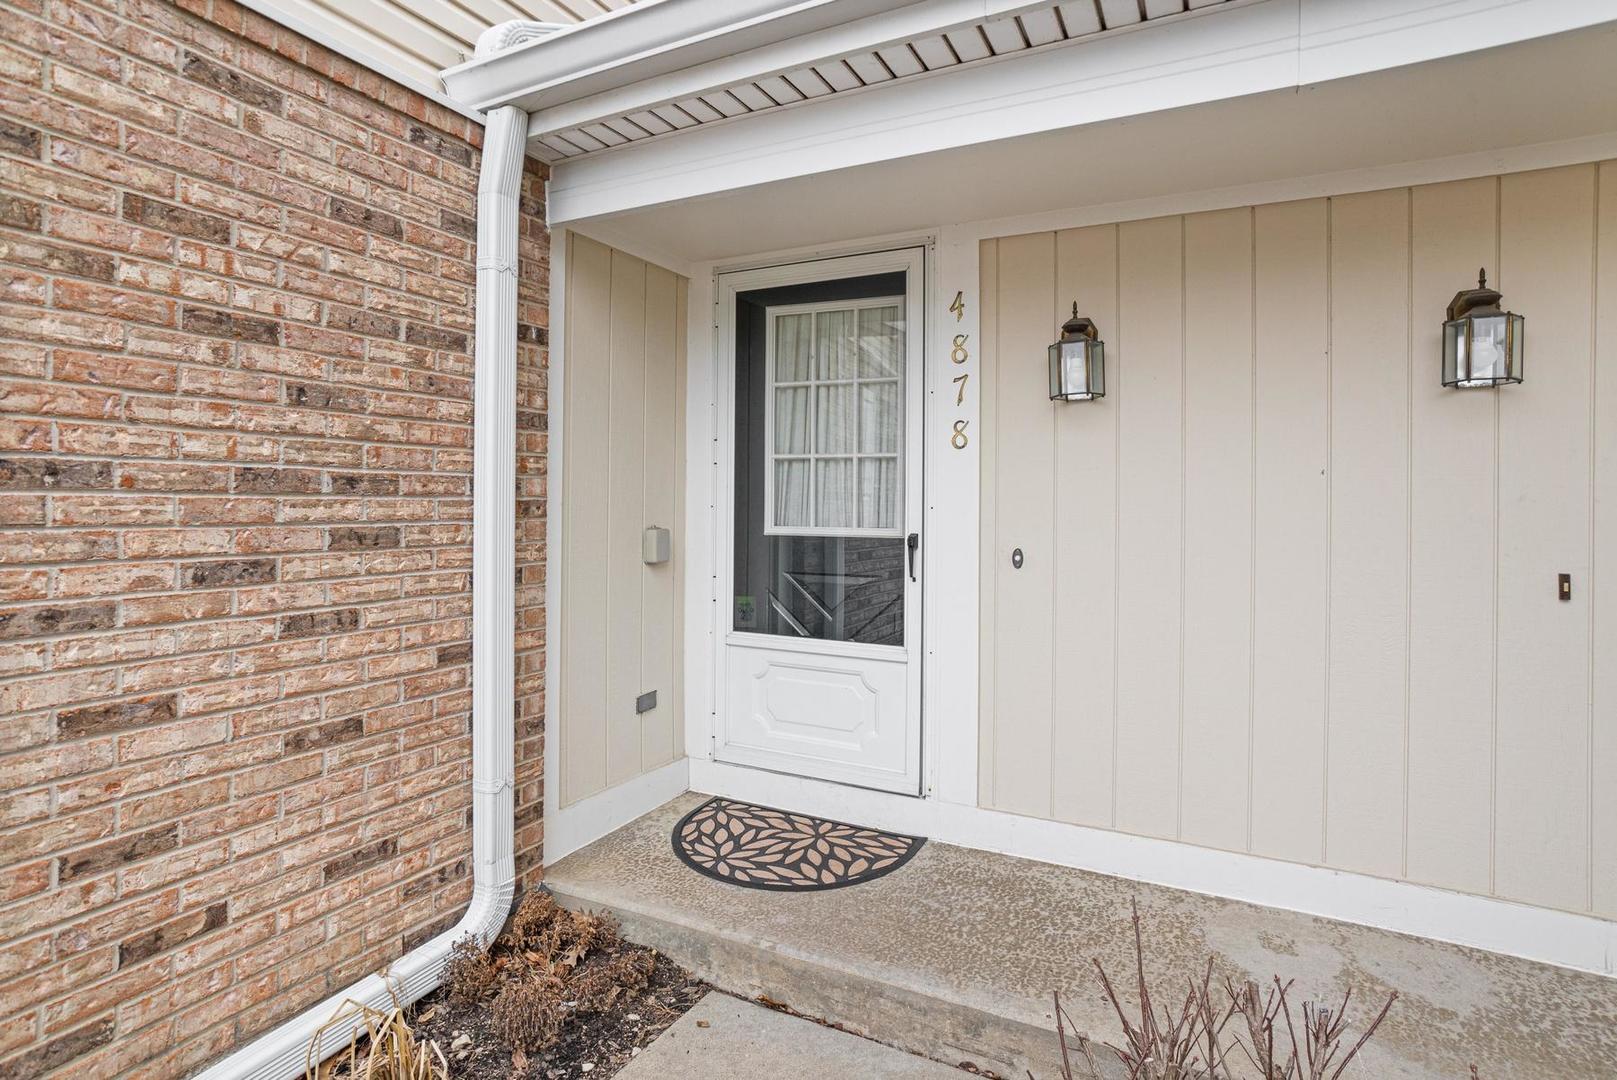 4878 Prestwick, Hoffman Estates, Illinois, 60010